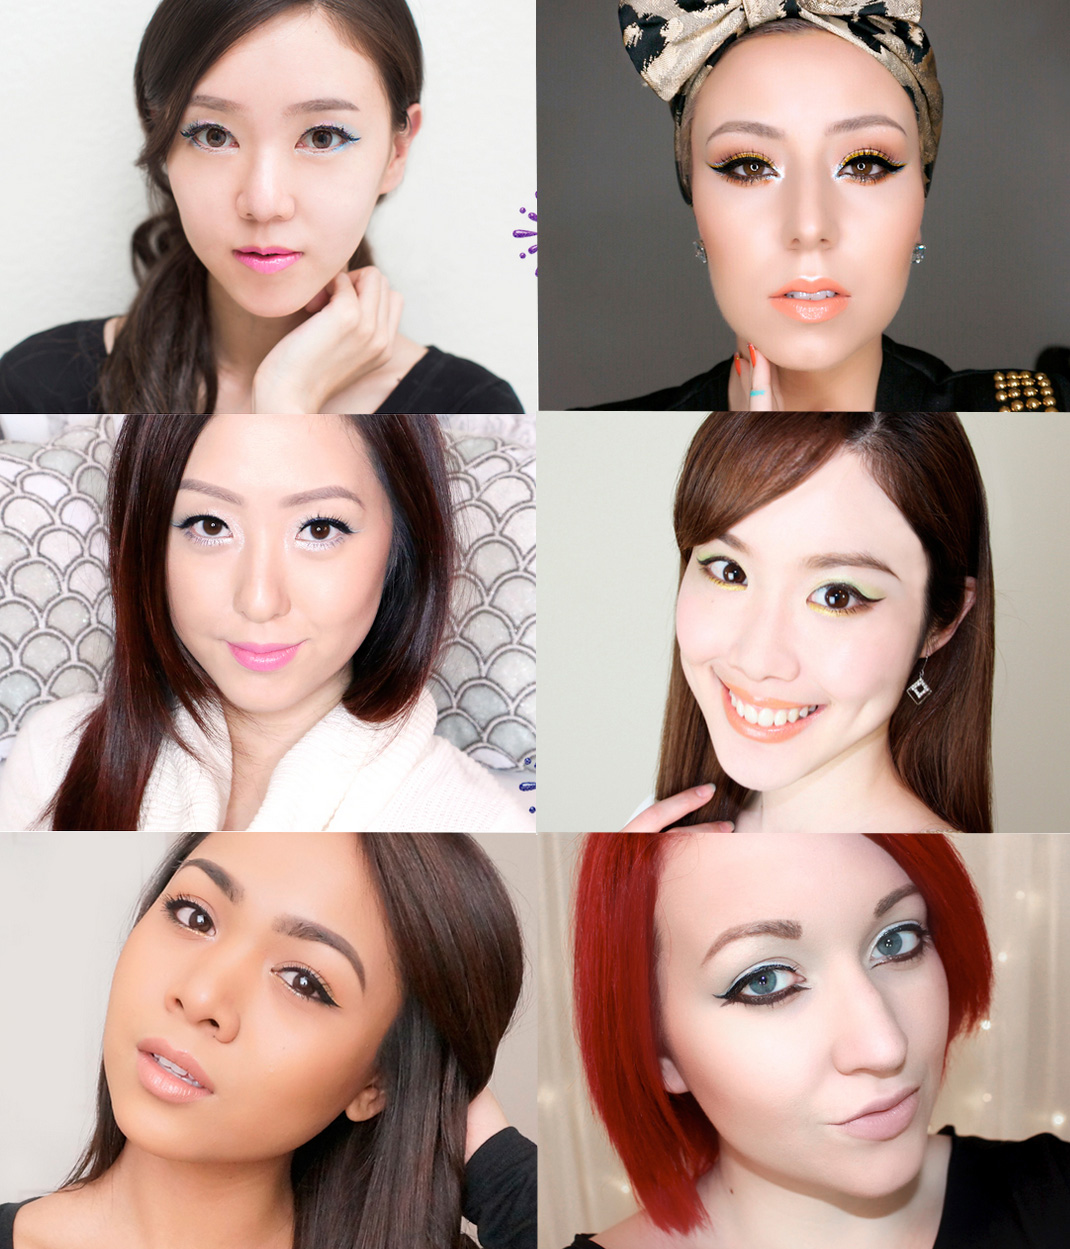 shu uemura, beauty, blogger, vlogger, metallic bouquet